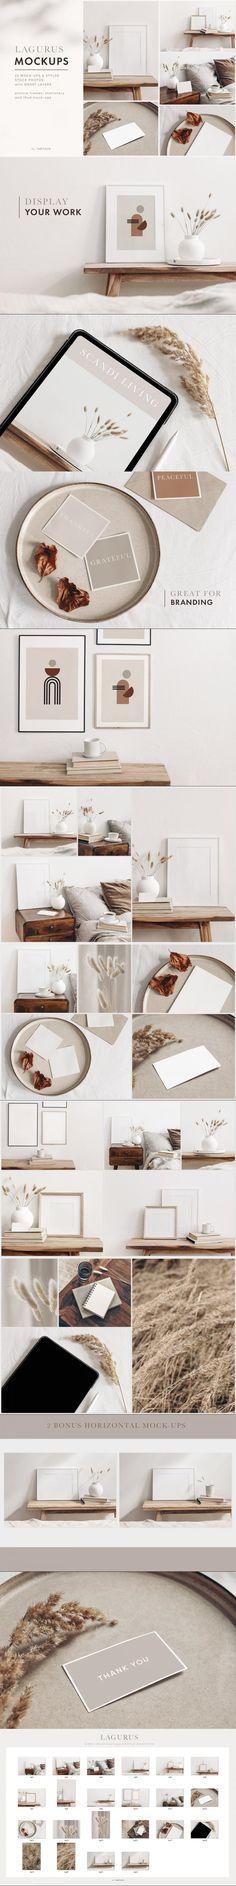 Lagurus photos & mockups bundle #day #TemplateDesign #straightcut #grass #ribbon #beige #linen #pencil #coffee #greetingcardmockup #foliage #celebration #web #mockuprsvp #rsvp #scandi #nordic #above #copyspace Shades Of Beige, Header Image, Scene Creator, Mockup Templates, Wedding Cards, Envelope, Branding Design, Anniversary Photography, Stock Photos